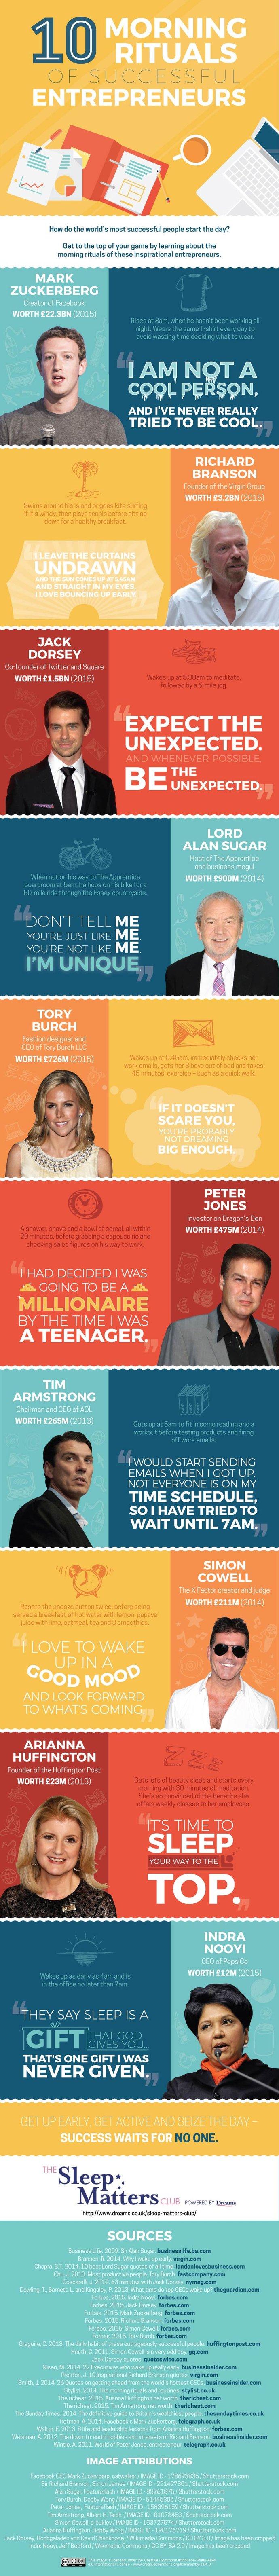 1431635672-10-morning-rituals-of-successful-entrepreneurs.jpg